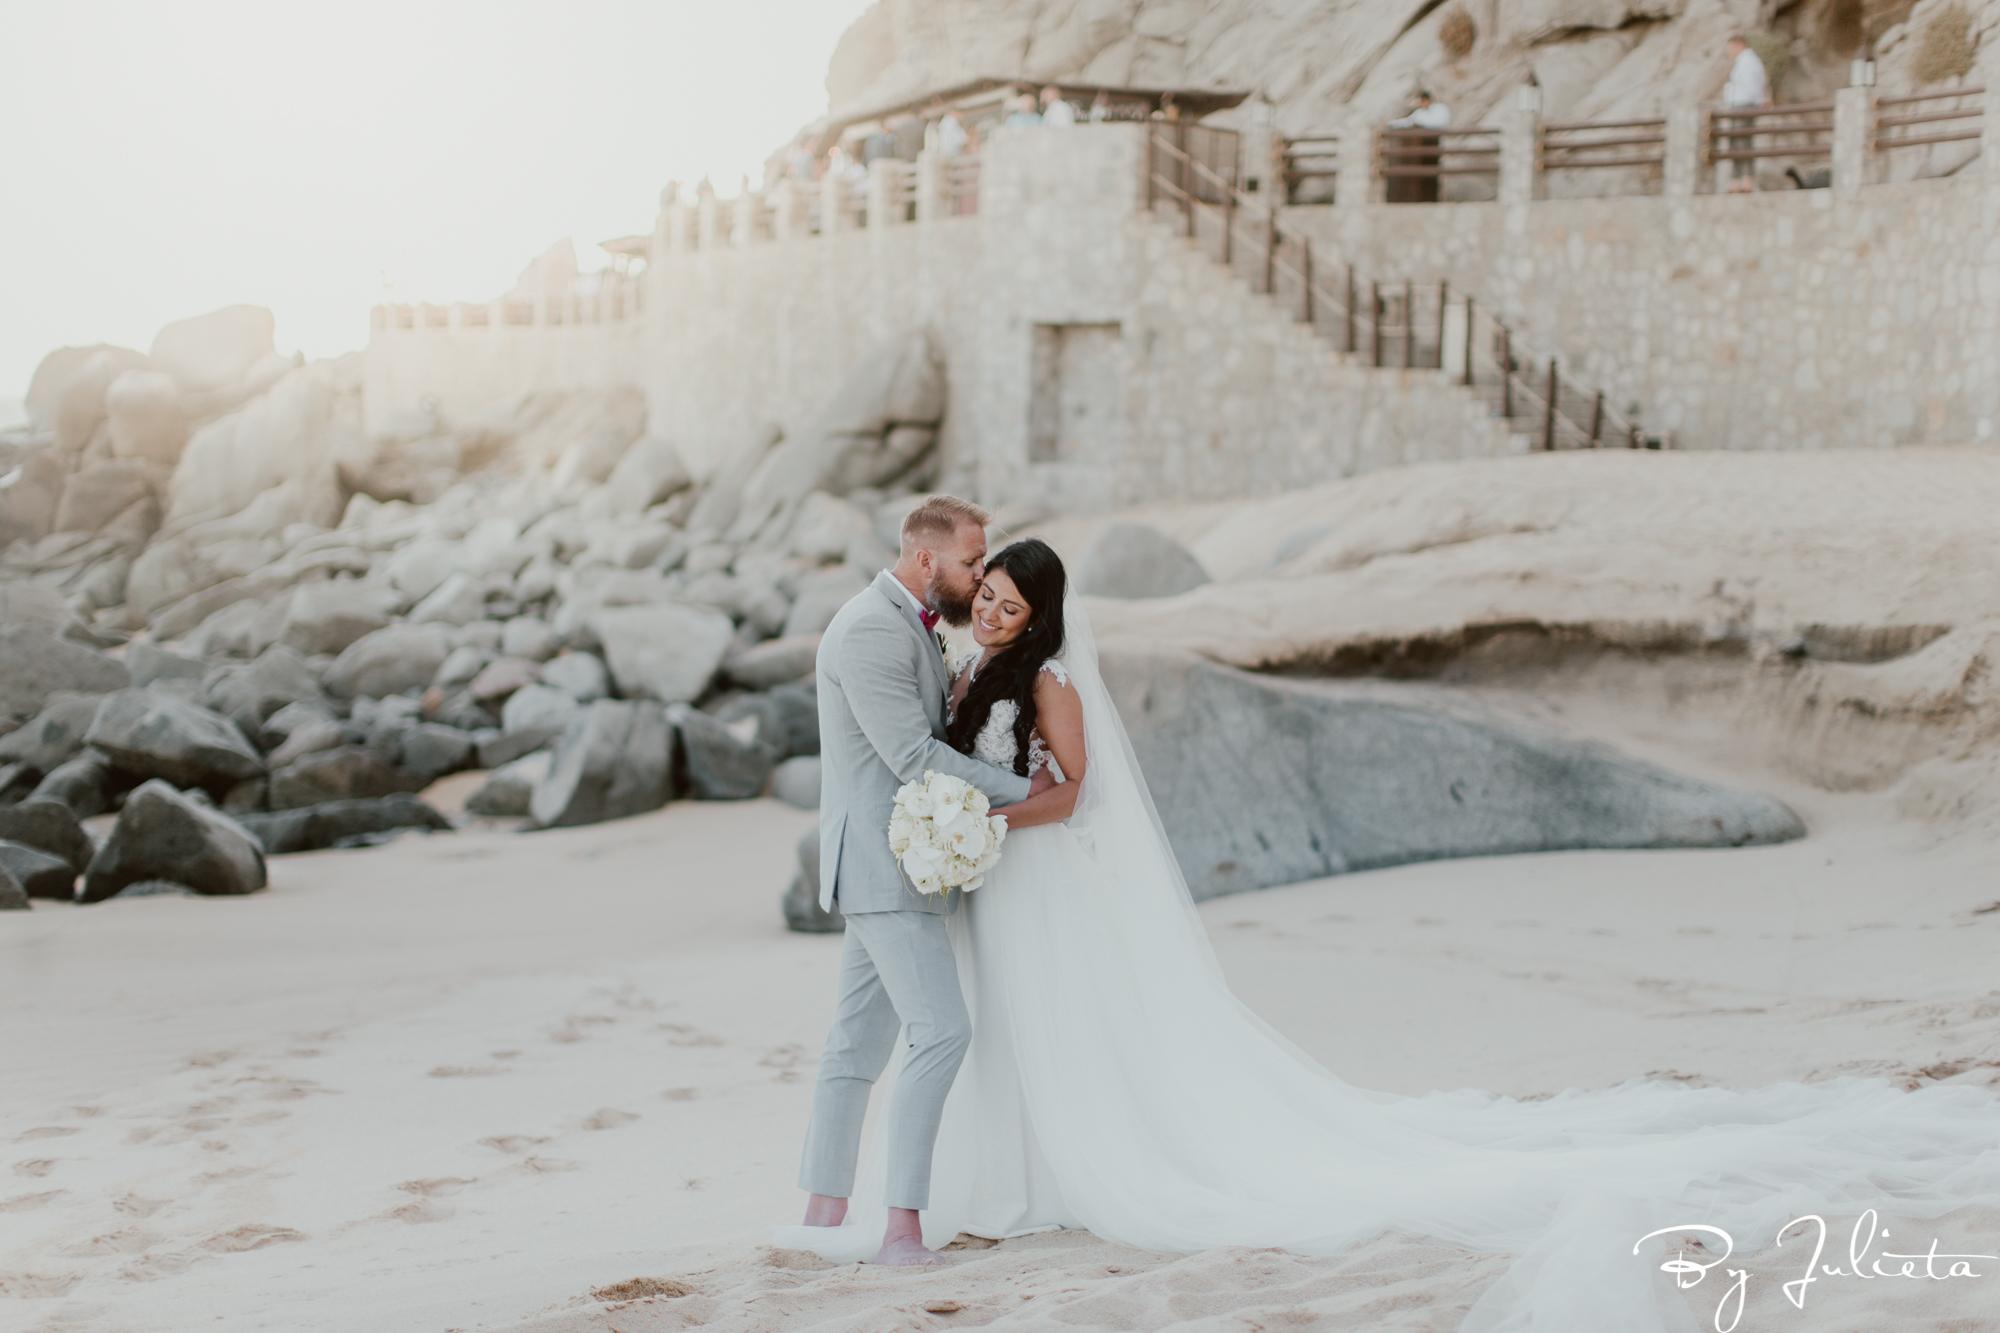 The Resort at Pedregal Wedding. T+C. Julieta Amezcua Photography.577.JPG